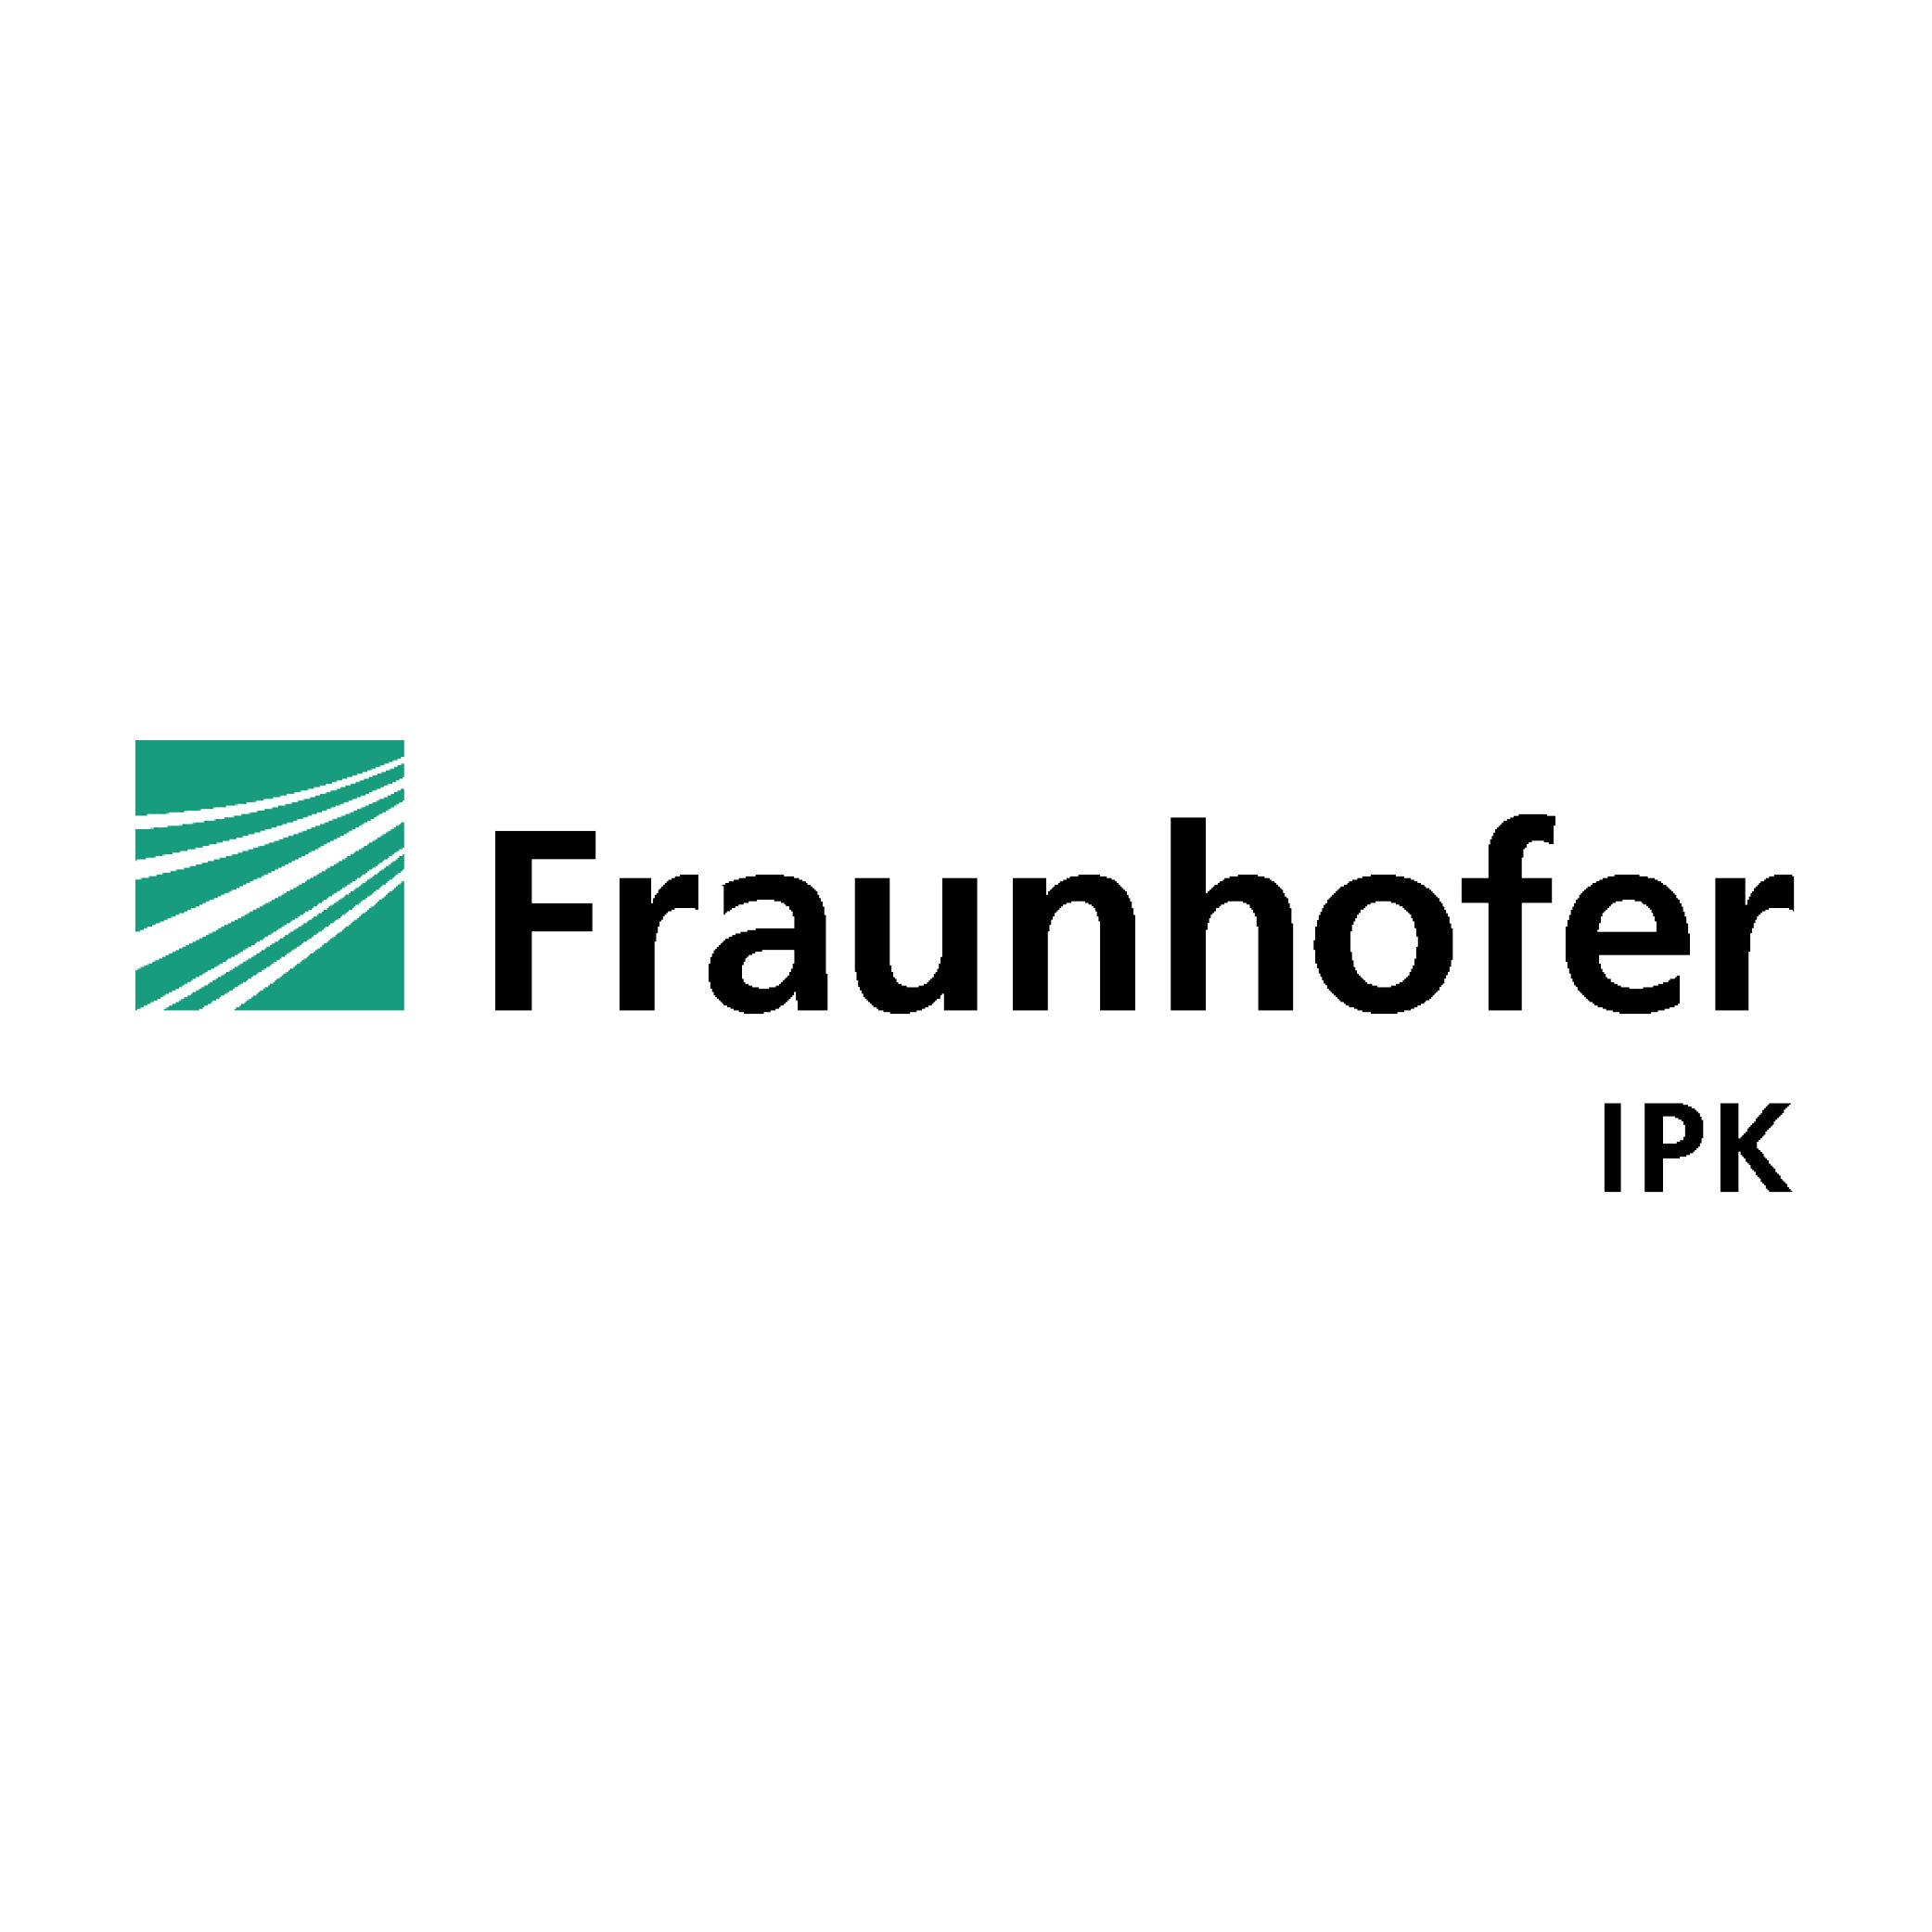 Fraunhofer IKP